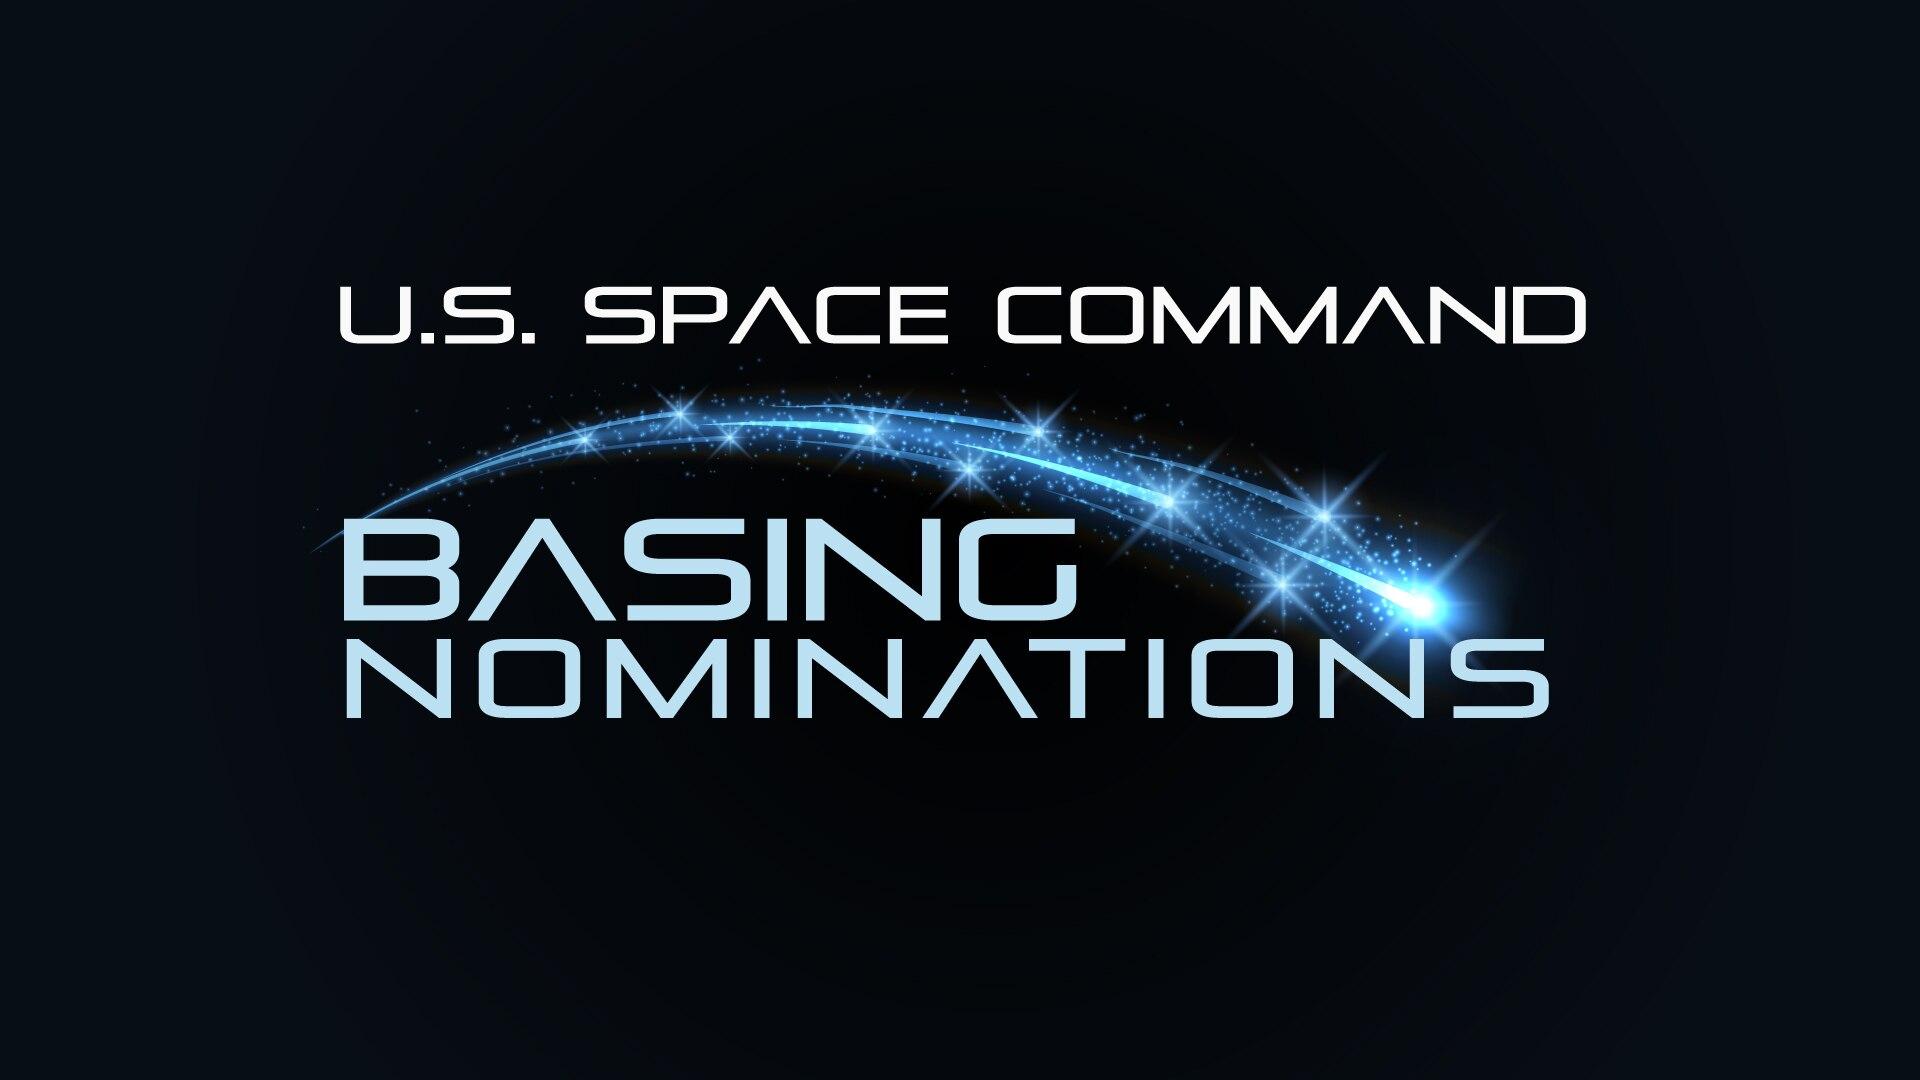 U.S. Space Command Basing Nomination Promo